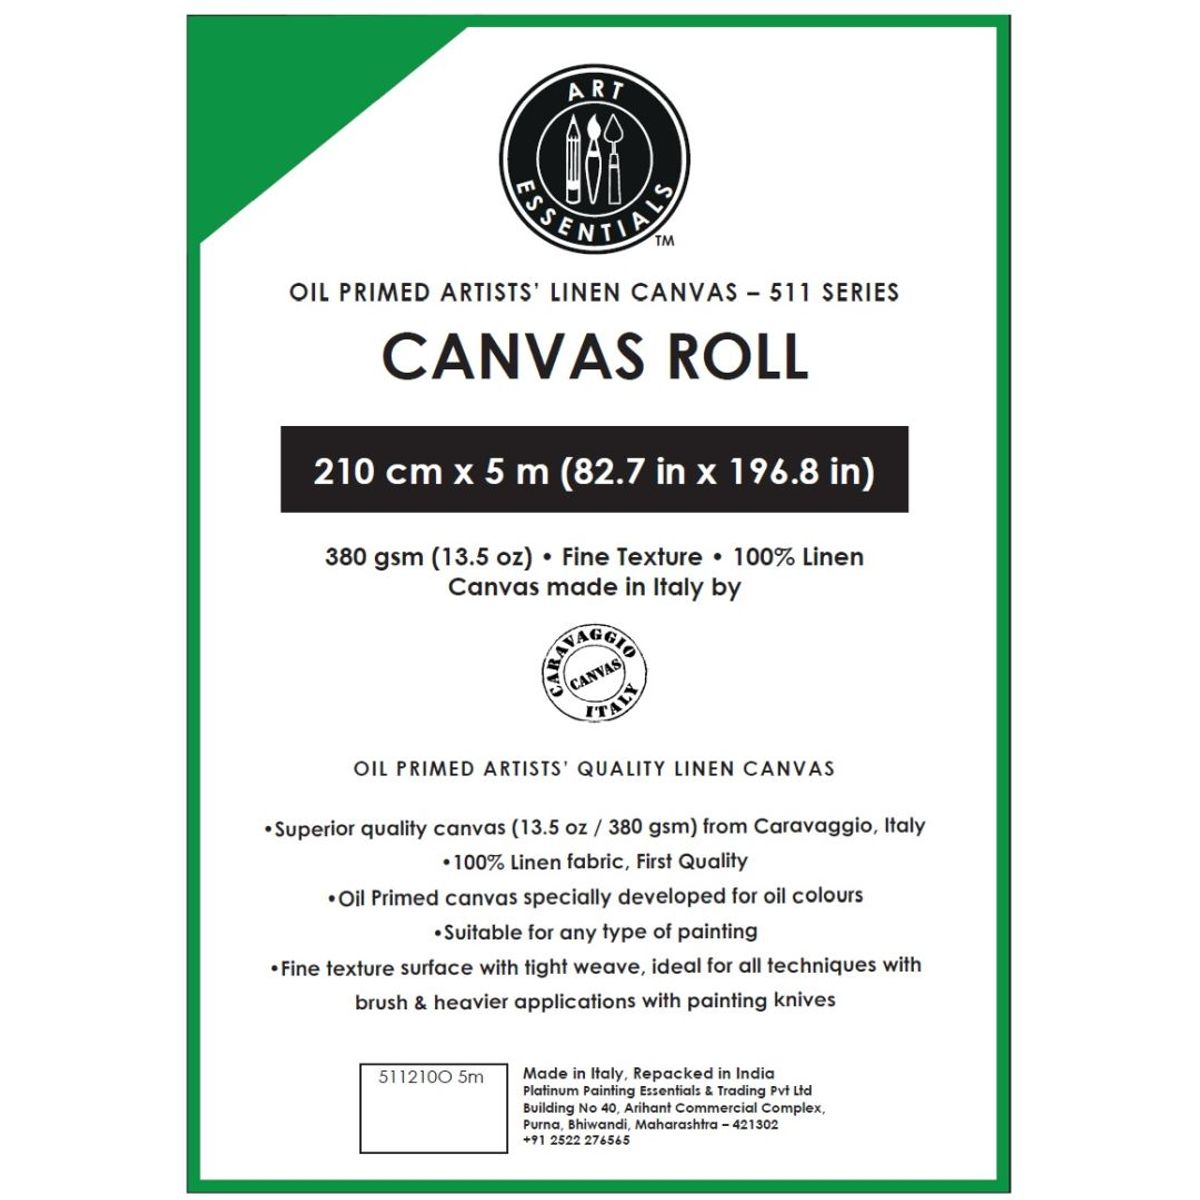 Caravaggio Oil Primed Artists' Linen Canvas Roll 511 Series 210cm x 5m